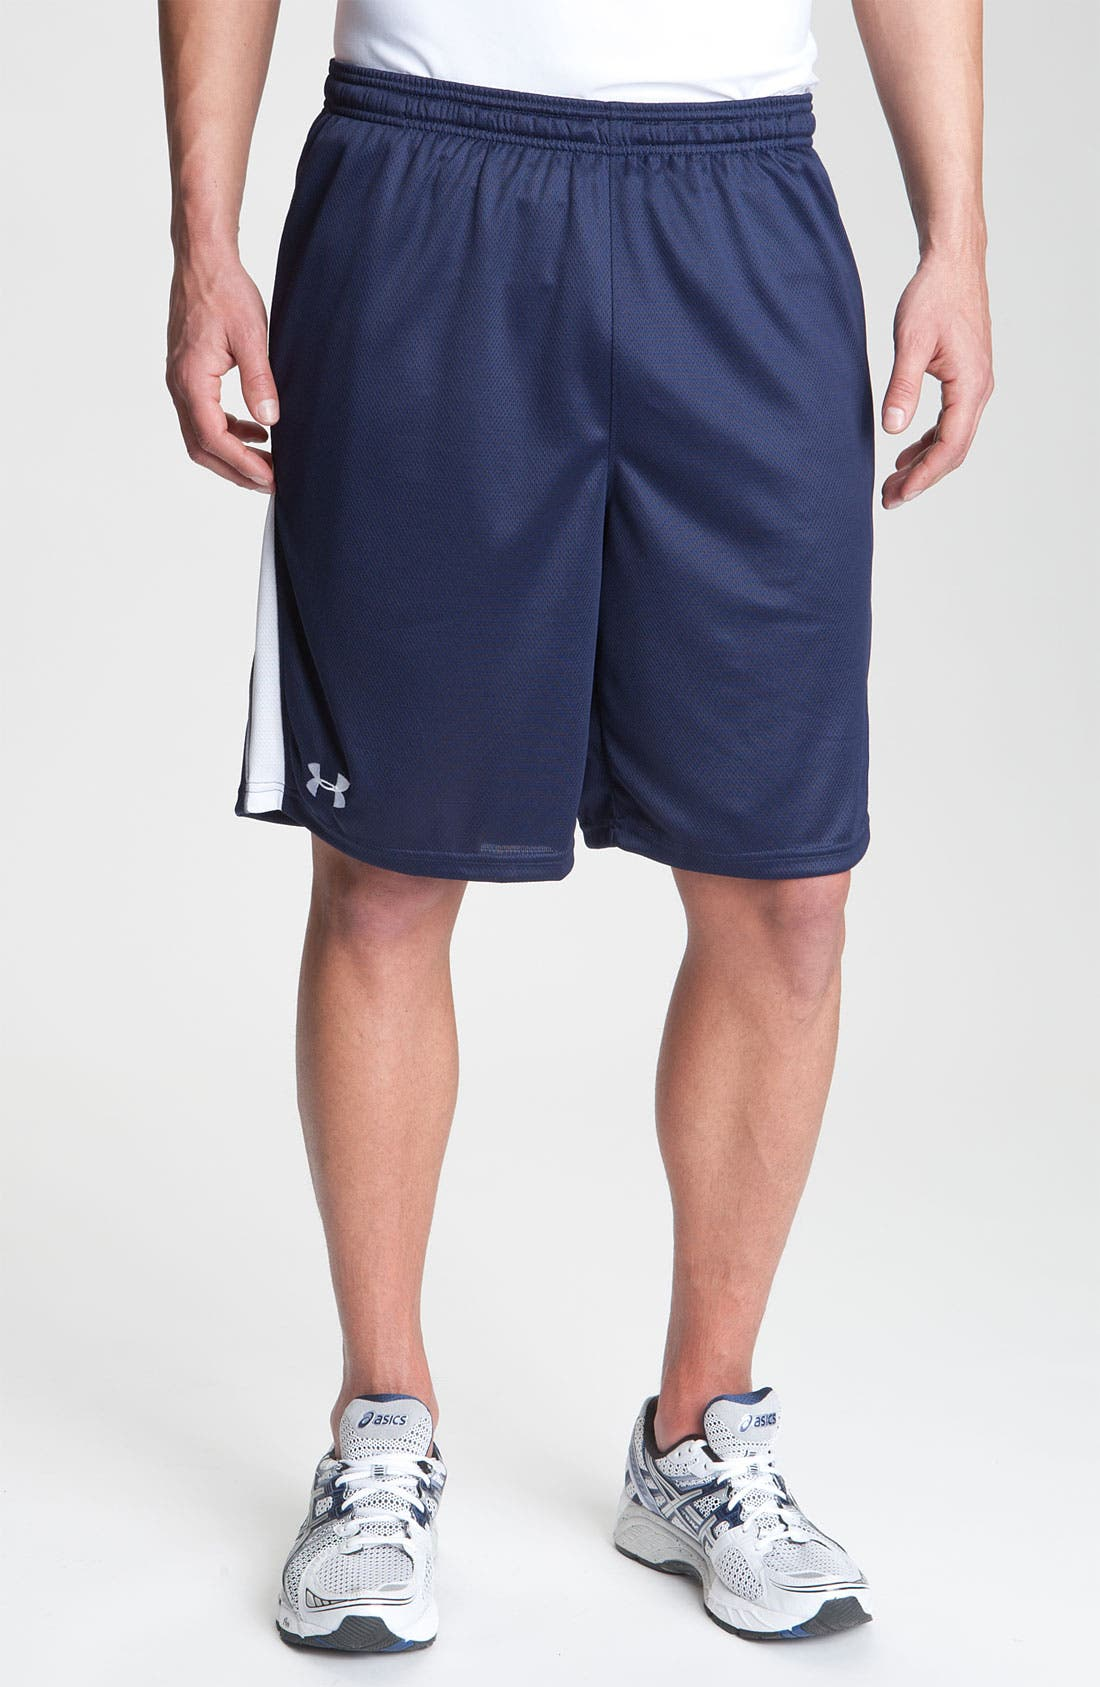 Main Image - Under Armour 'Flex Stripe' Shorts